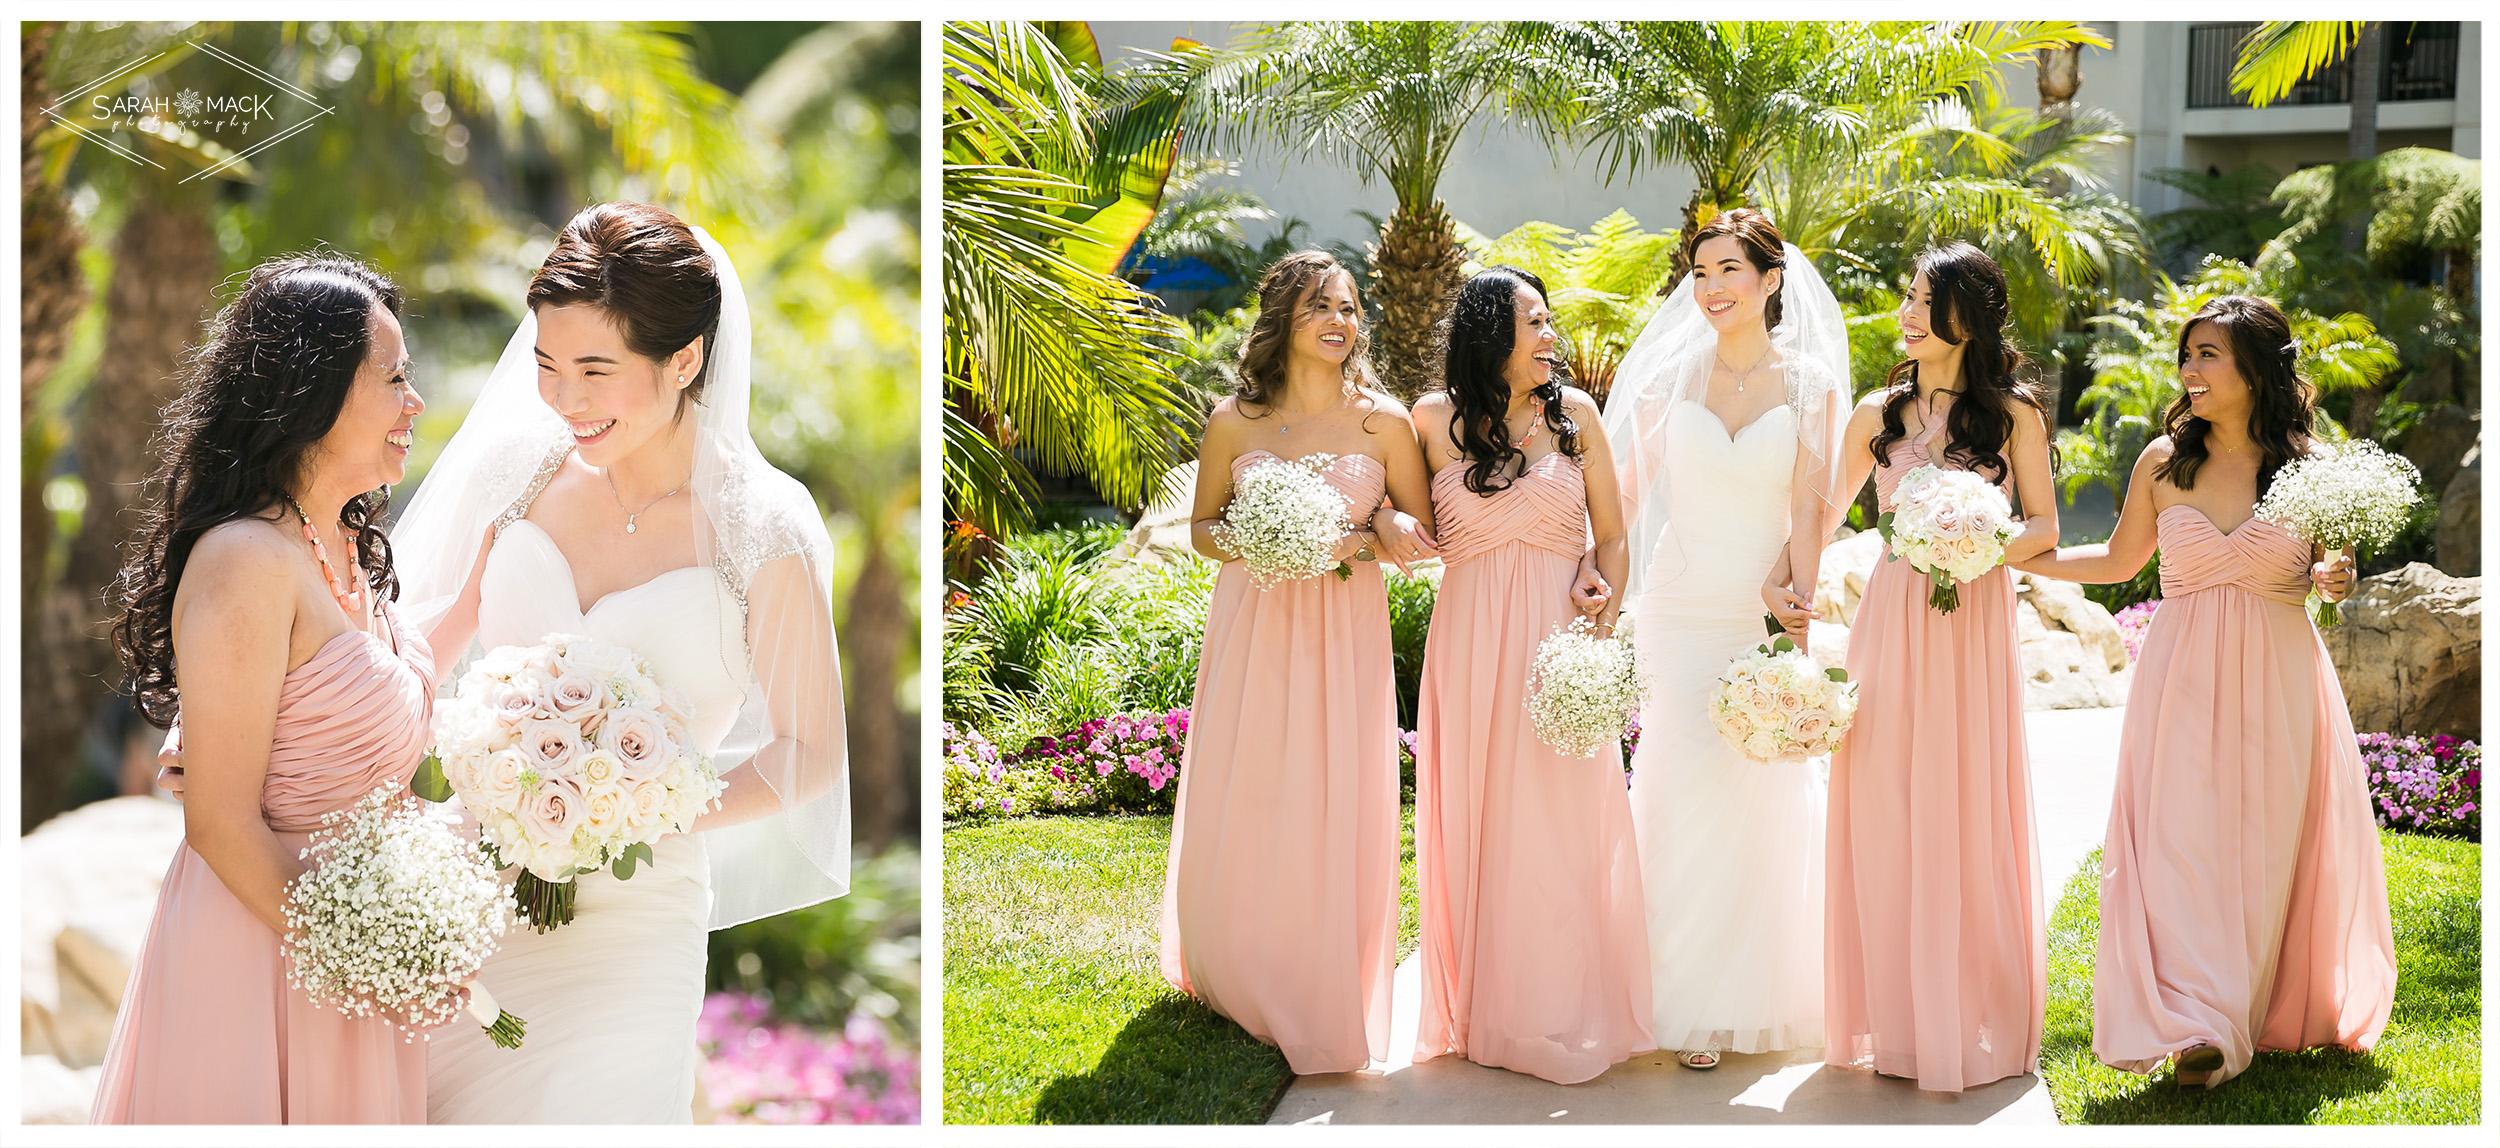 MC-Hyatt-Huntington-Beach-Wedding-Photography-12.jpg